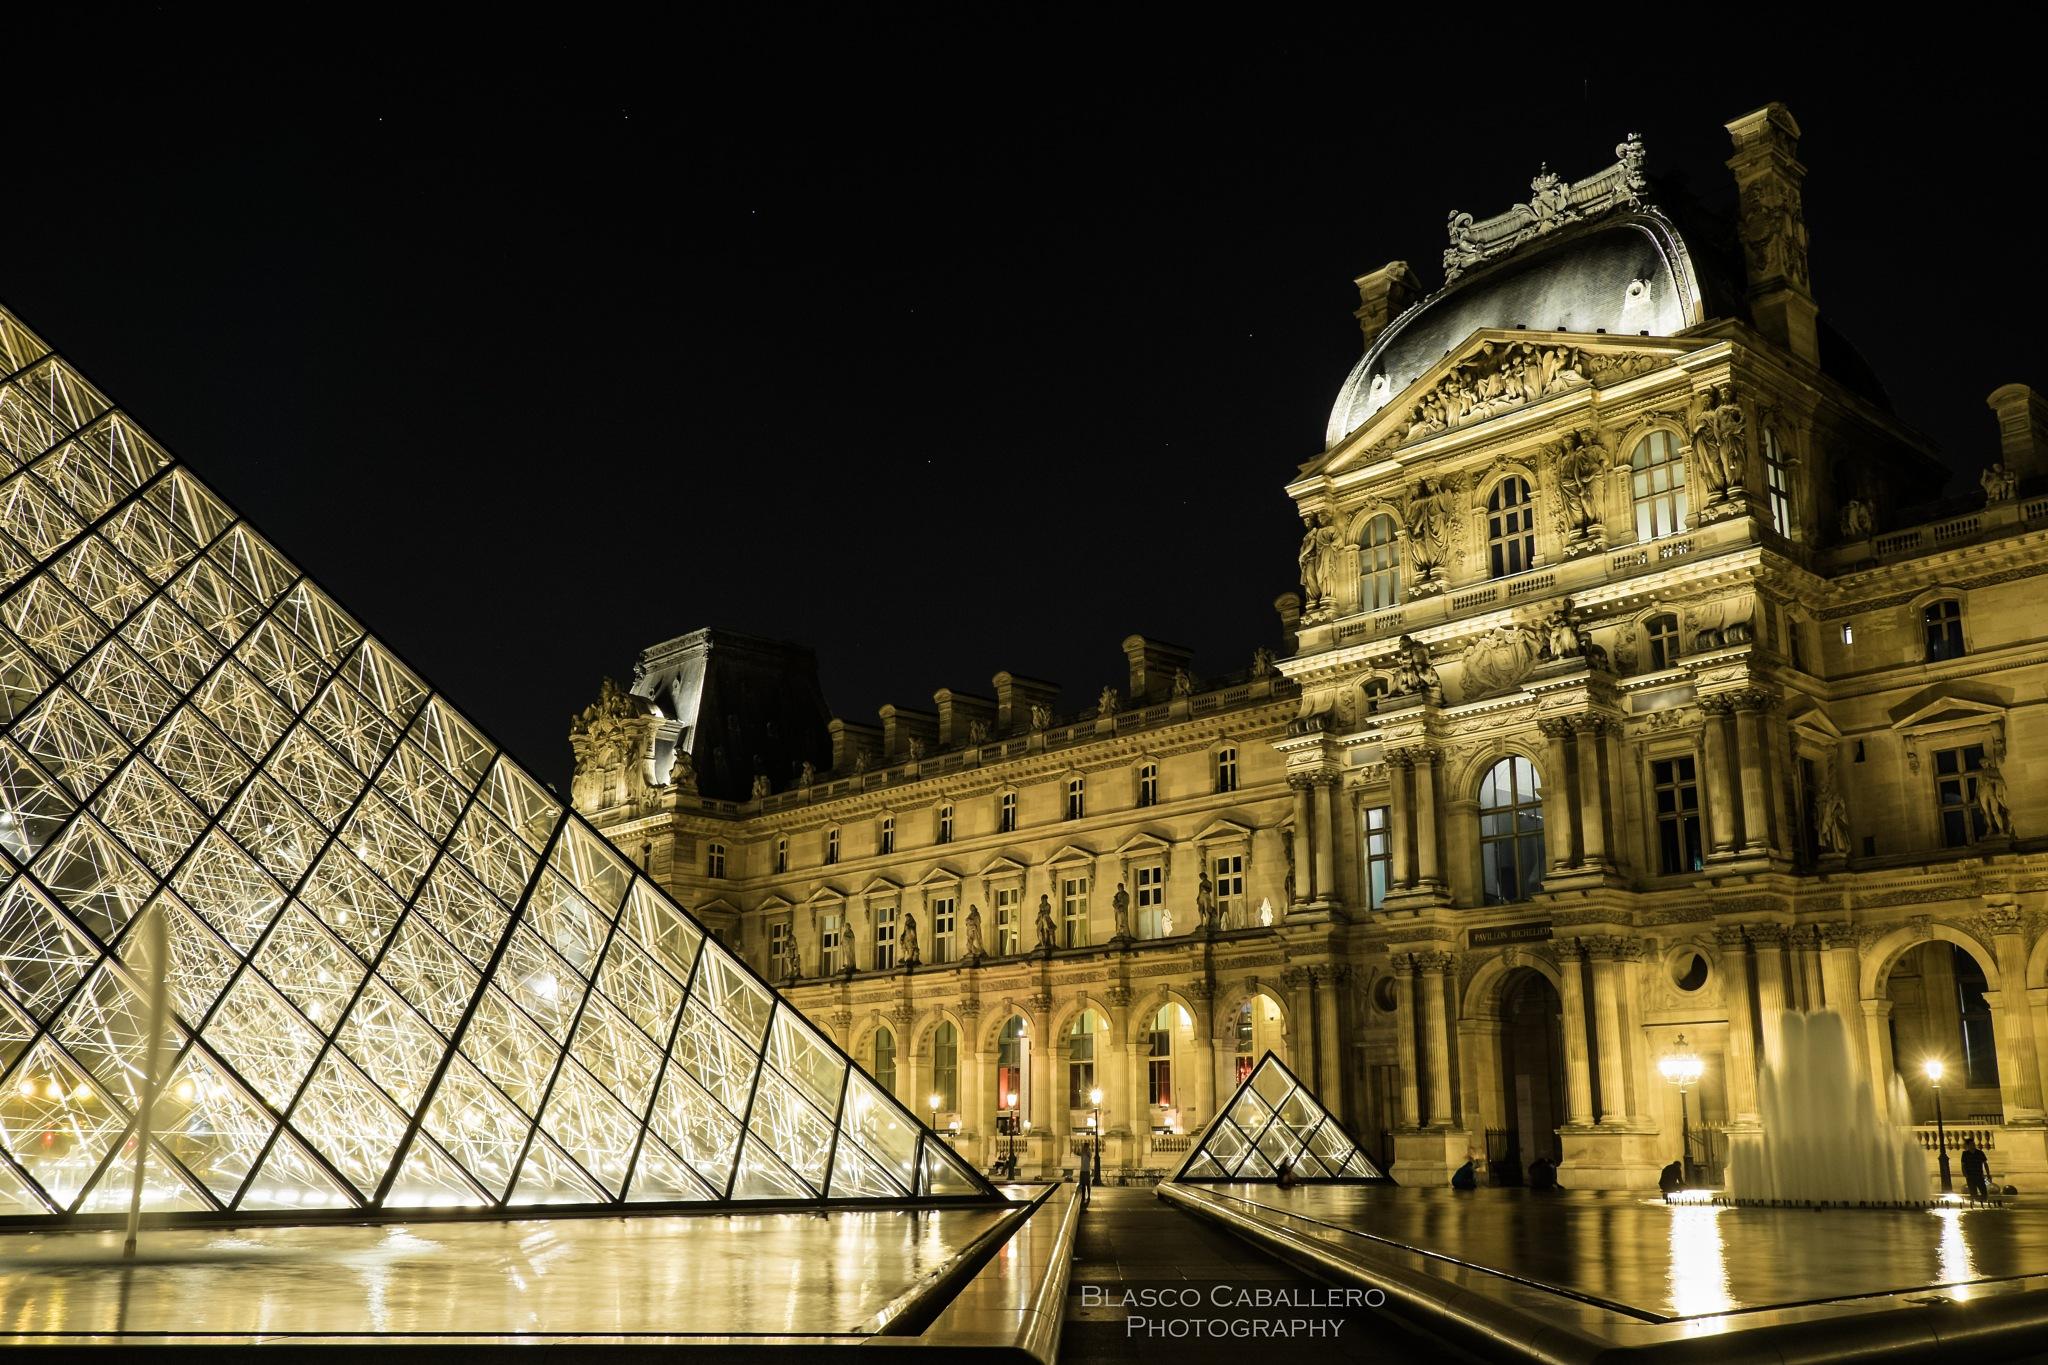 Glass Pyramid by Blasco Caballero